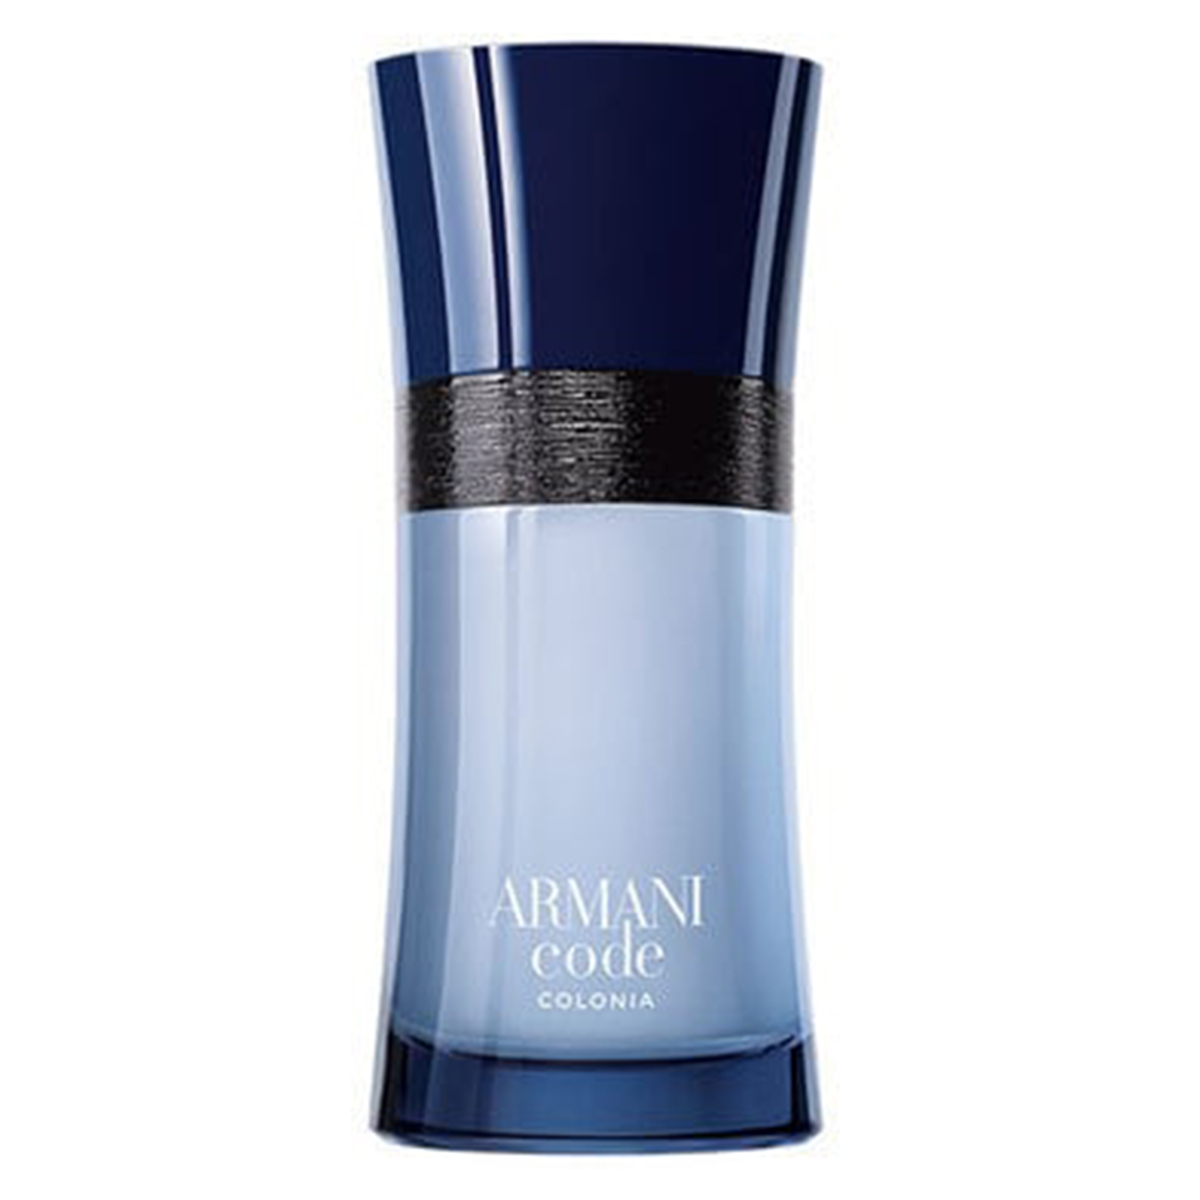 Armani Code Colonia EDT, £52, The Perfume Shop